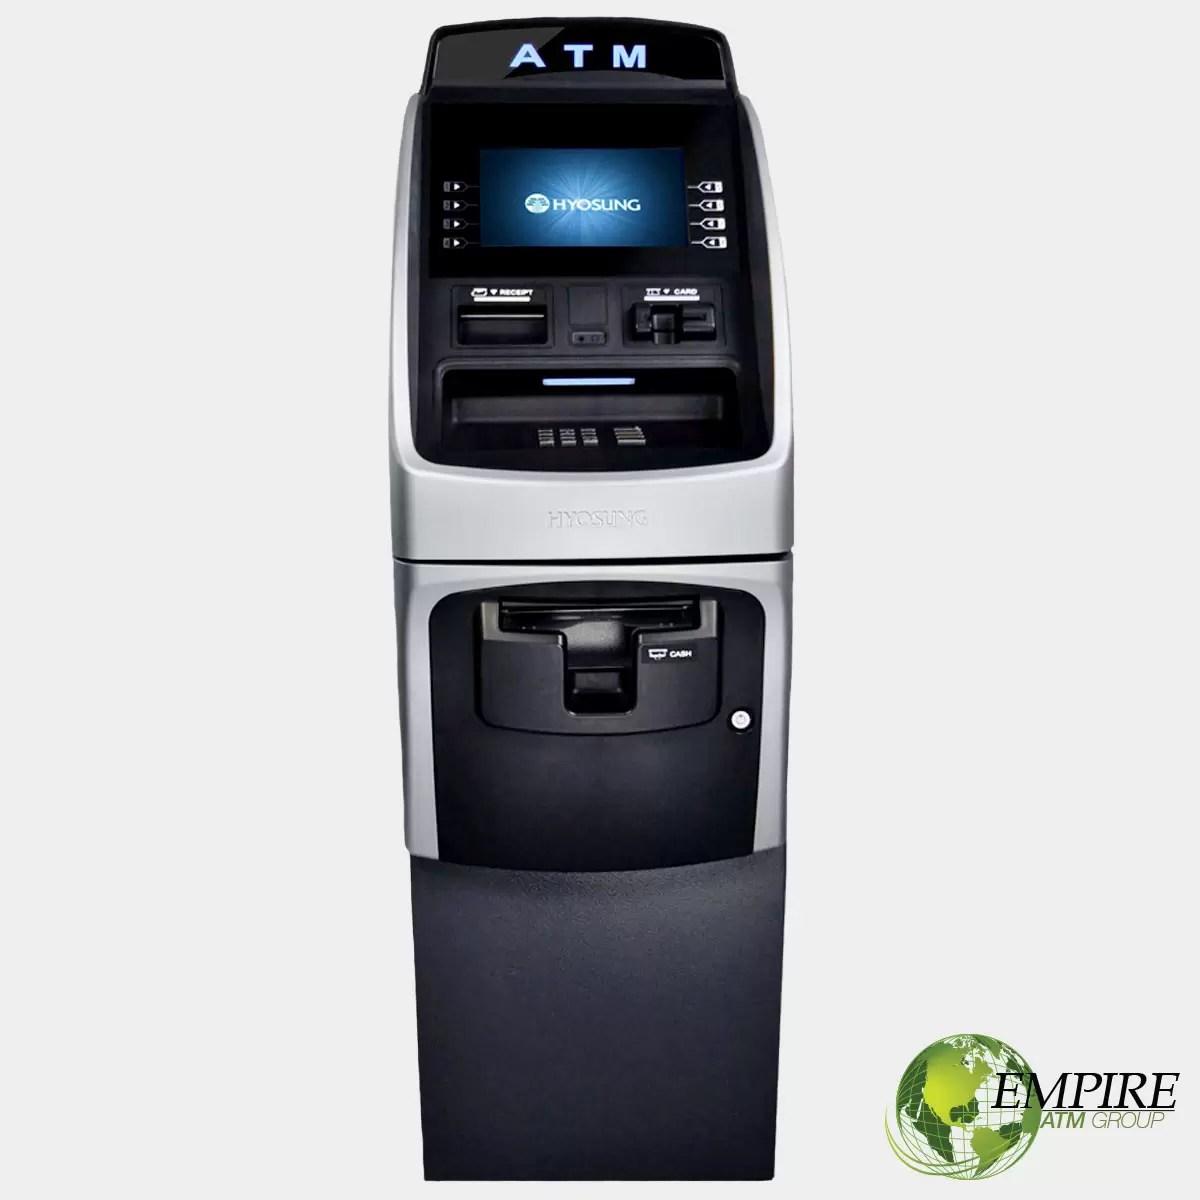 Nautilus Hyosung 2700CE ATM Machine